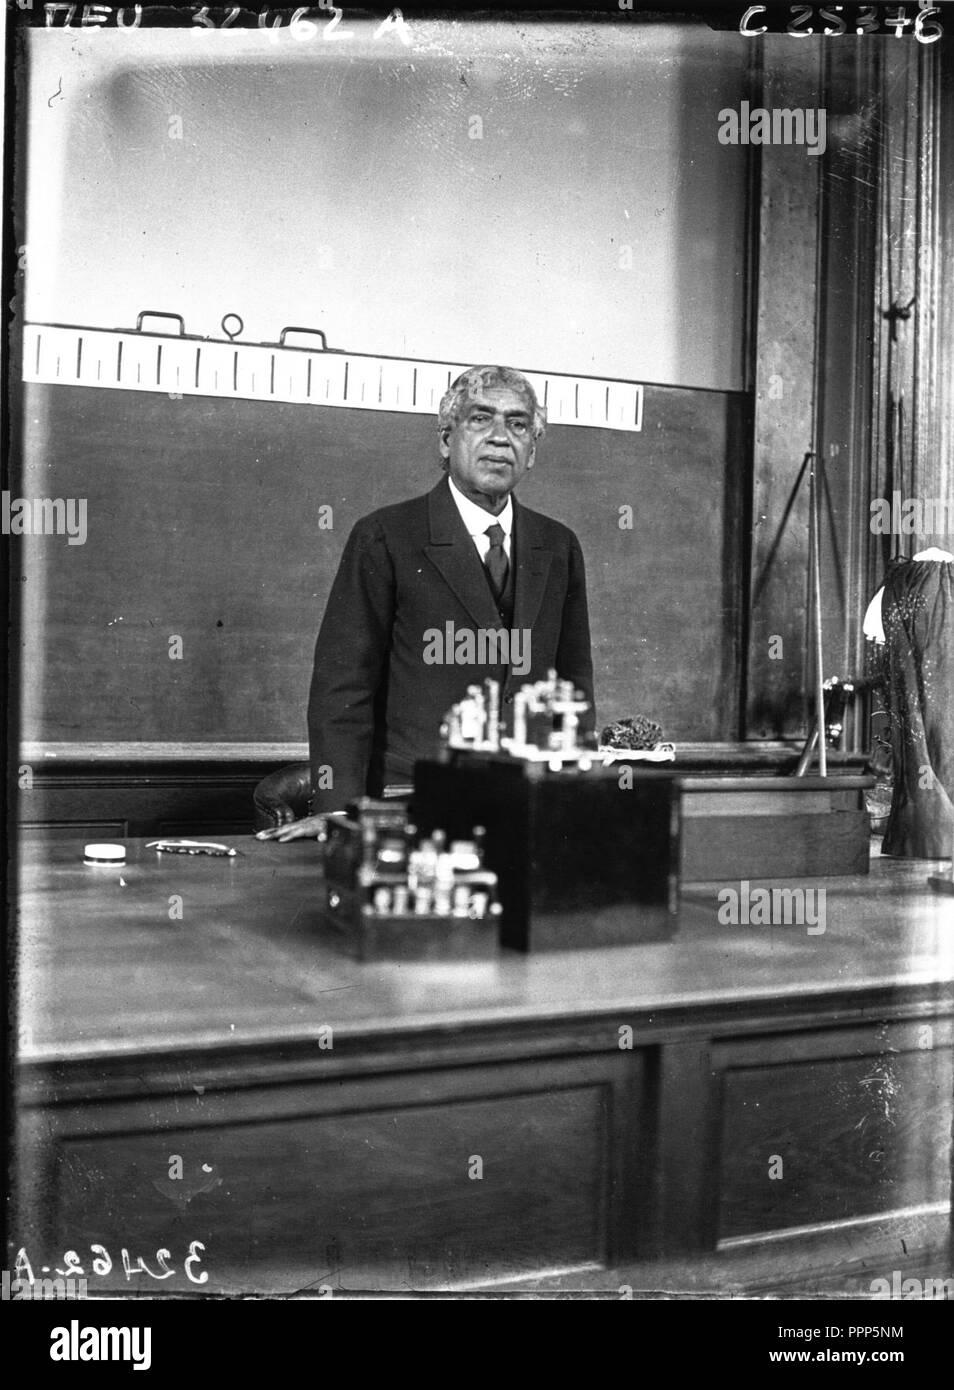 Jagadish Chandra Bose 1926 full image. - Stock Image